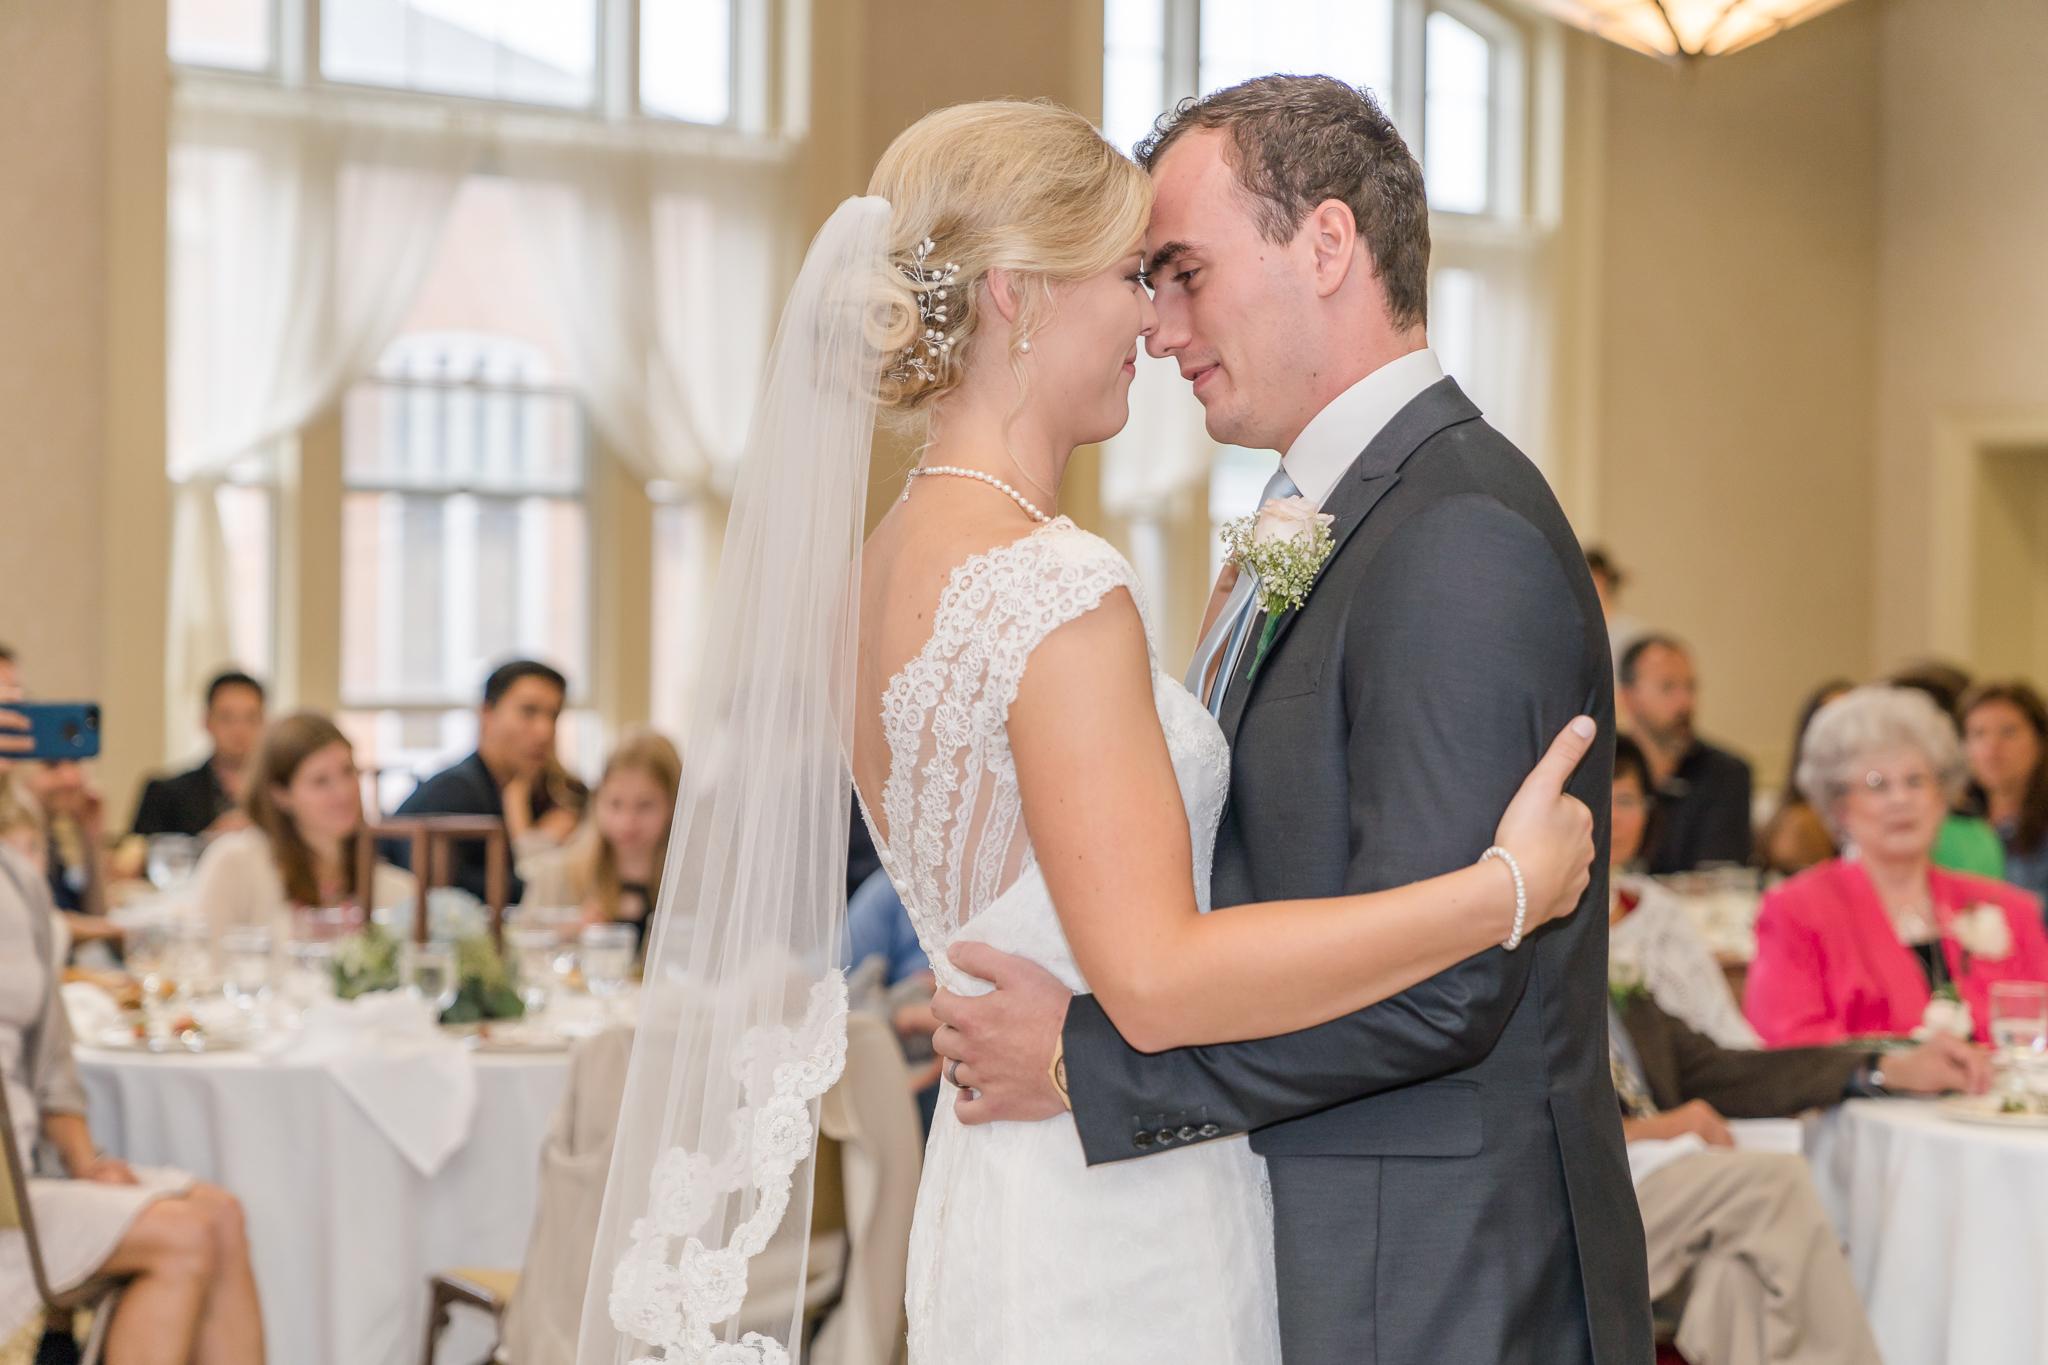 Westminister Hall Wedding Winona Lake Indiana07519.jpg